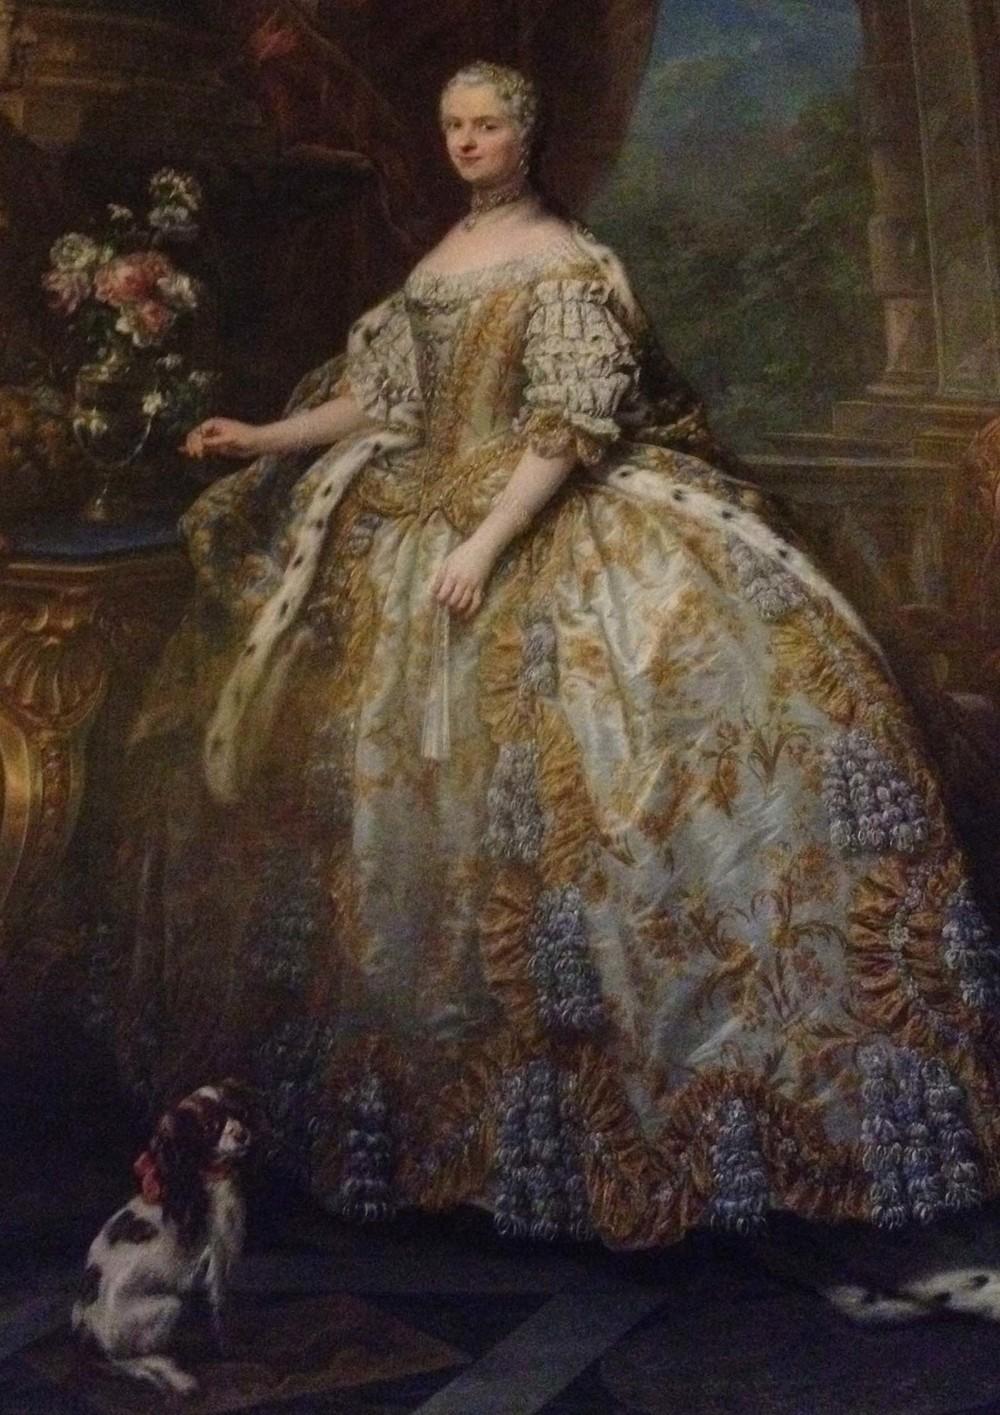 Empress at Versailles